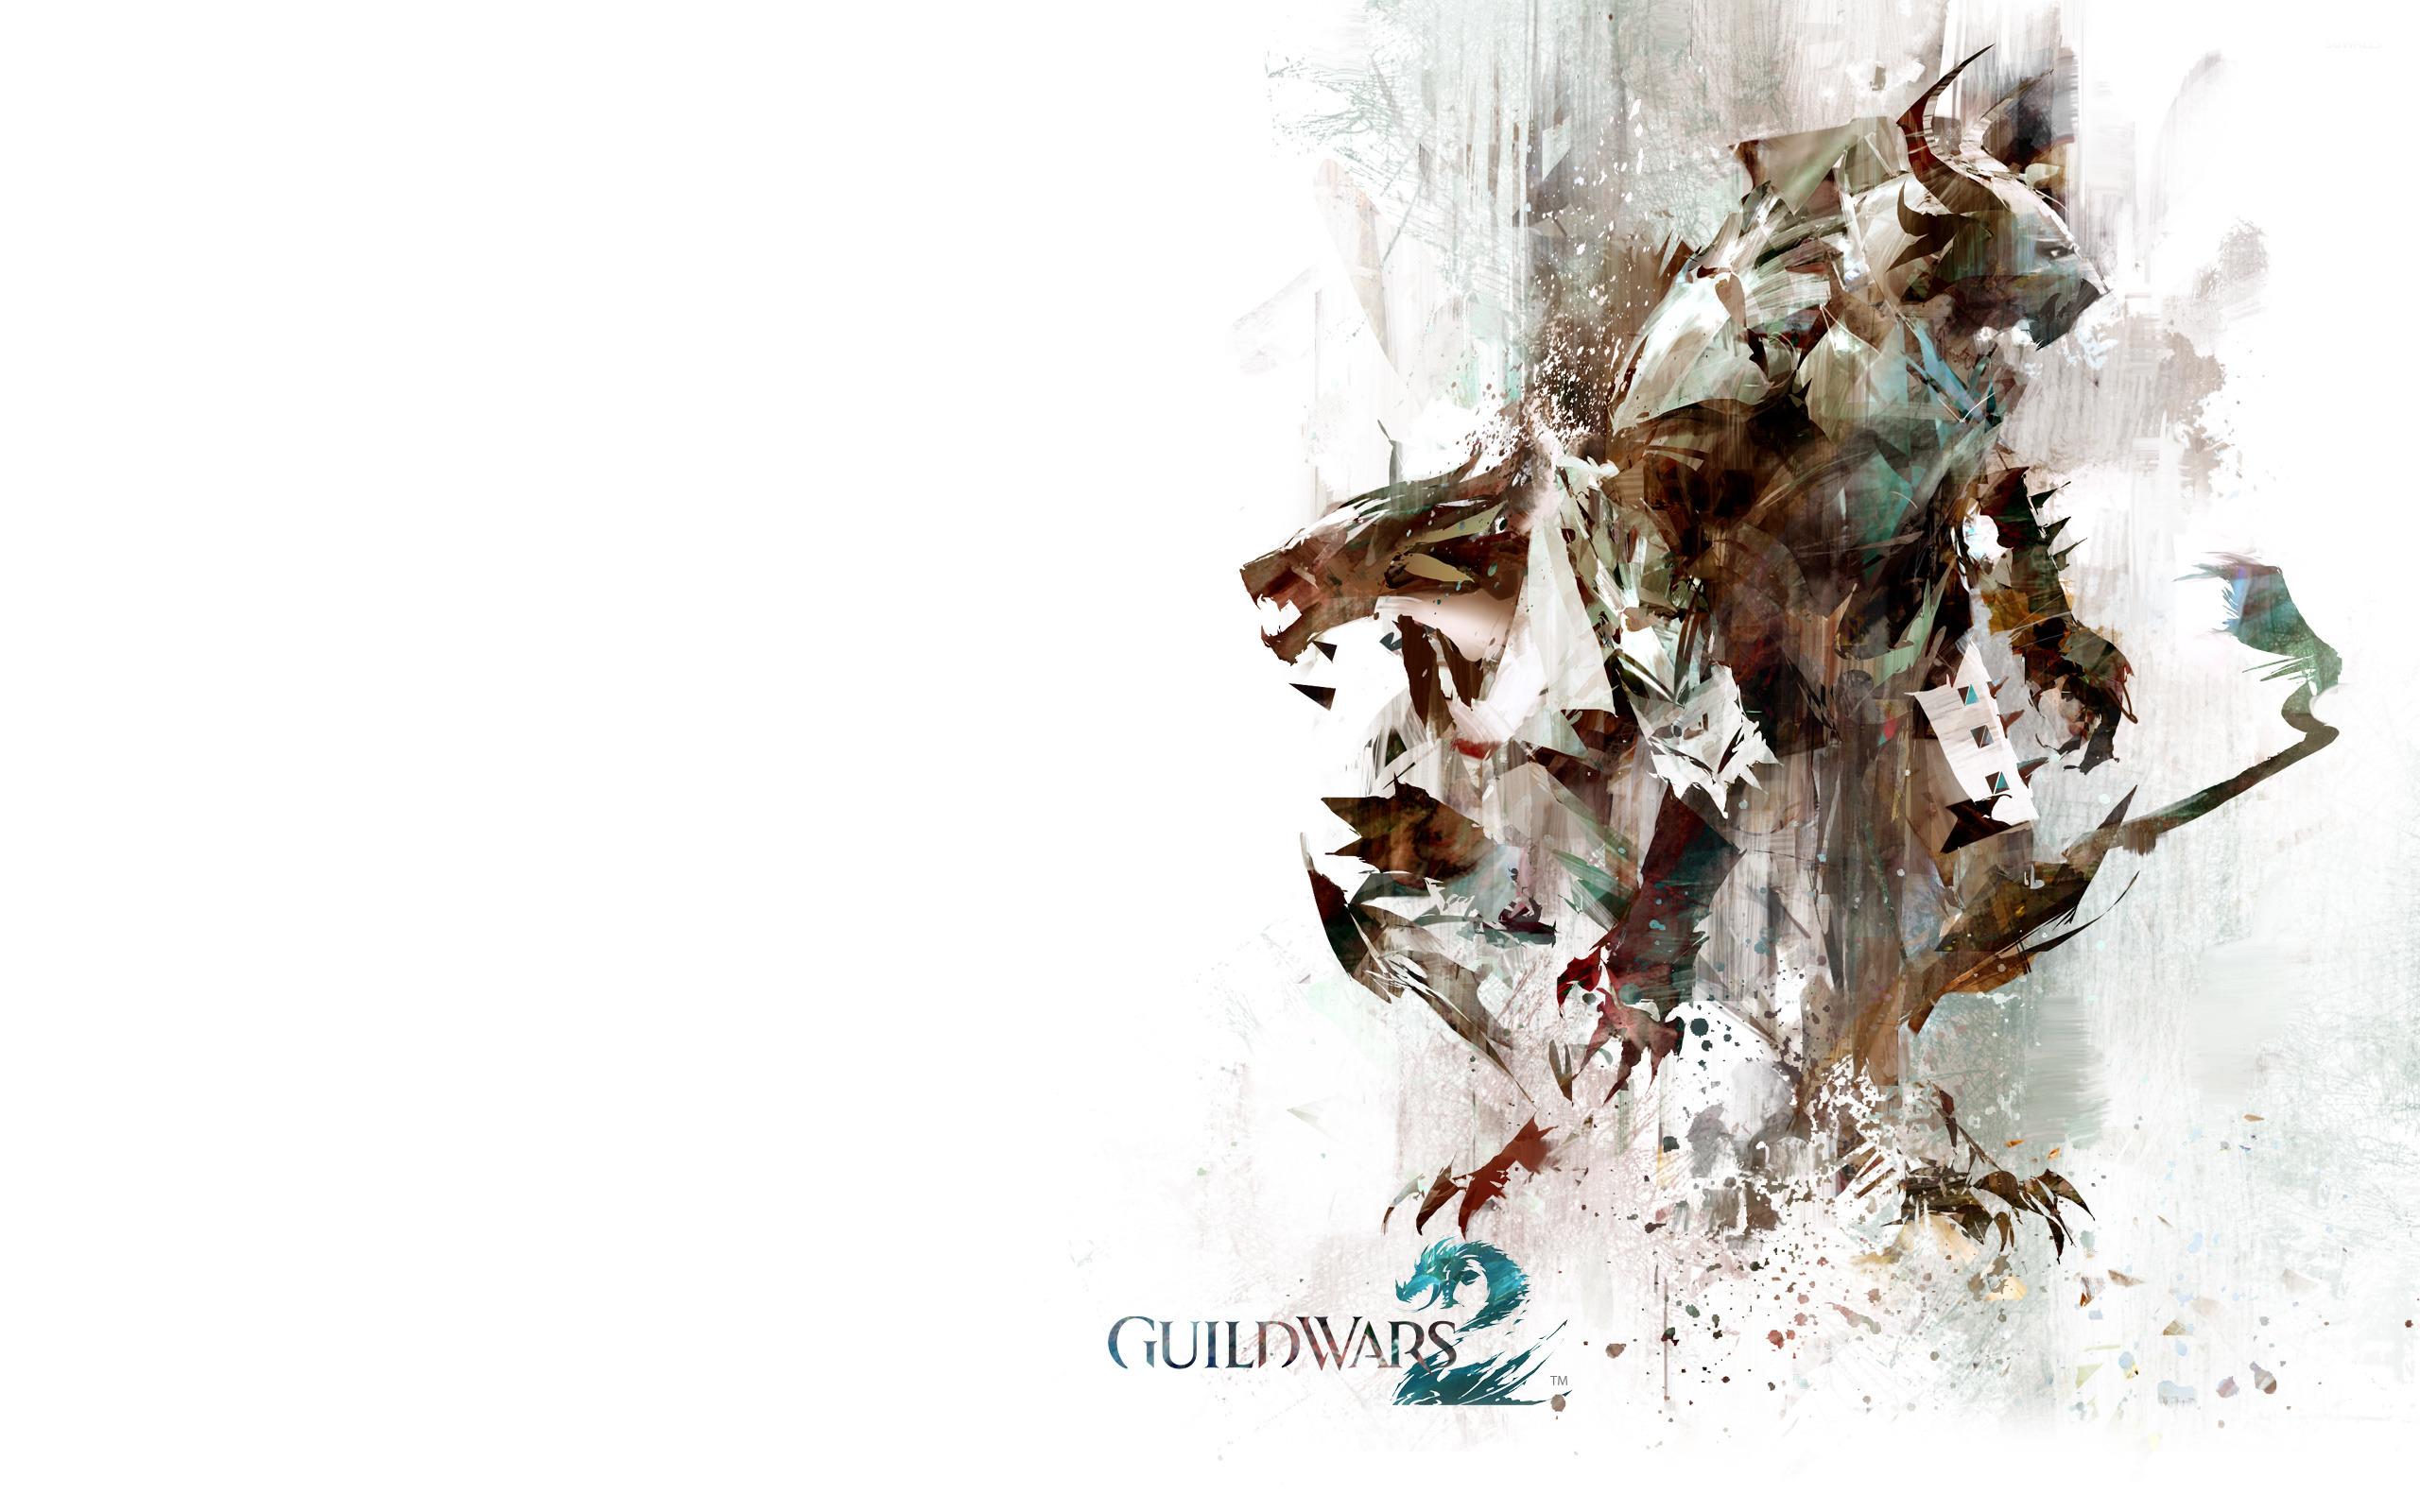 Guild Wars 2 19 Wallpaper Game Wallpapers 43352